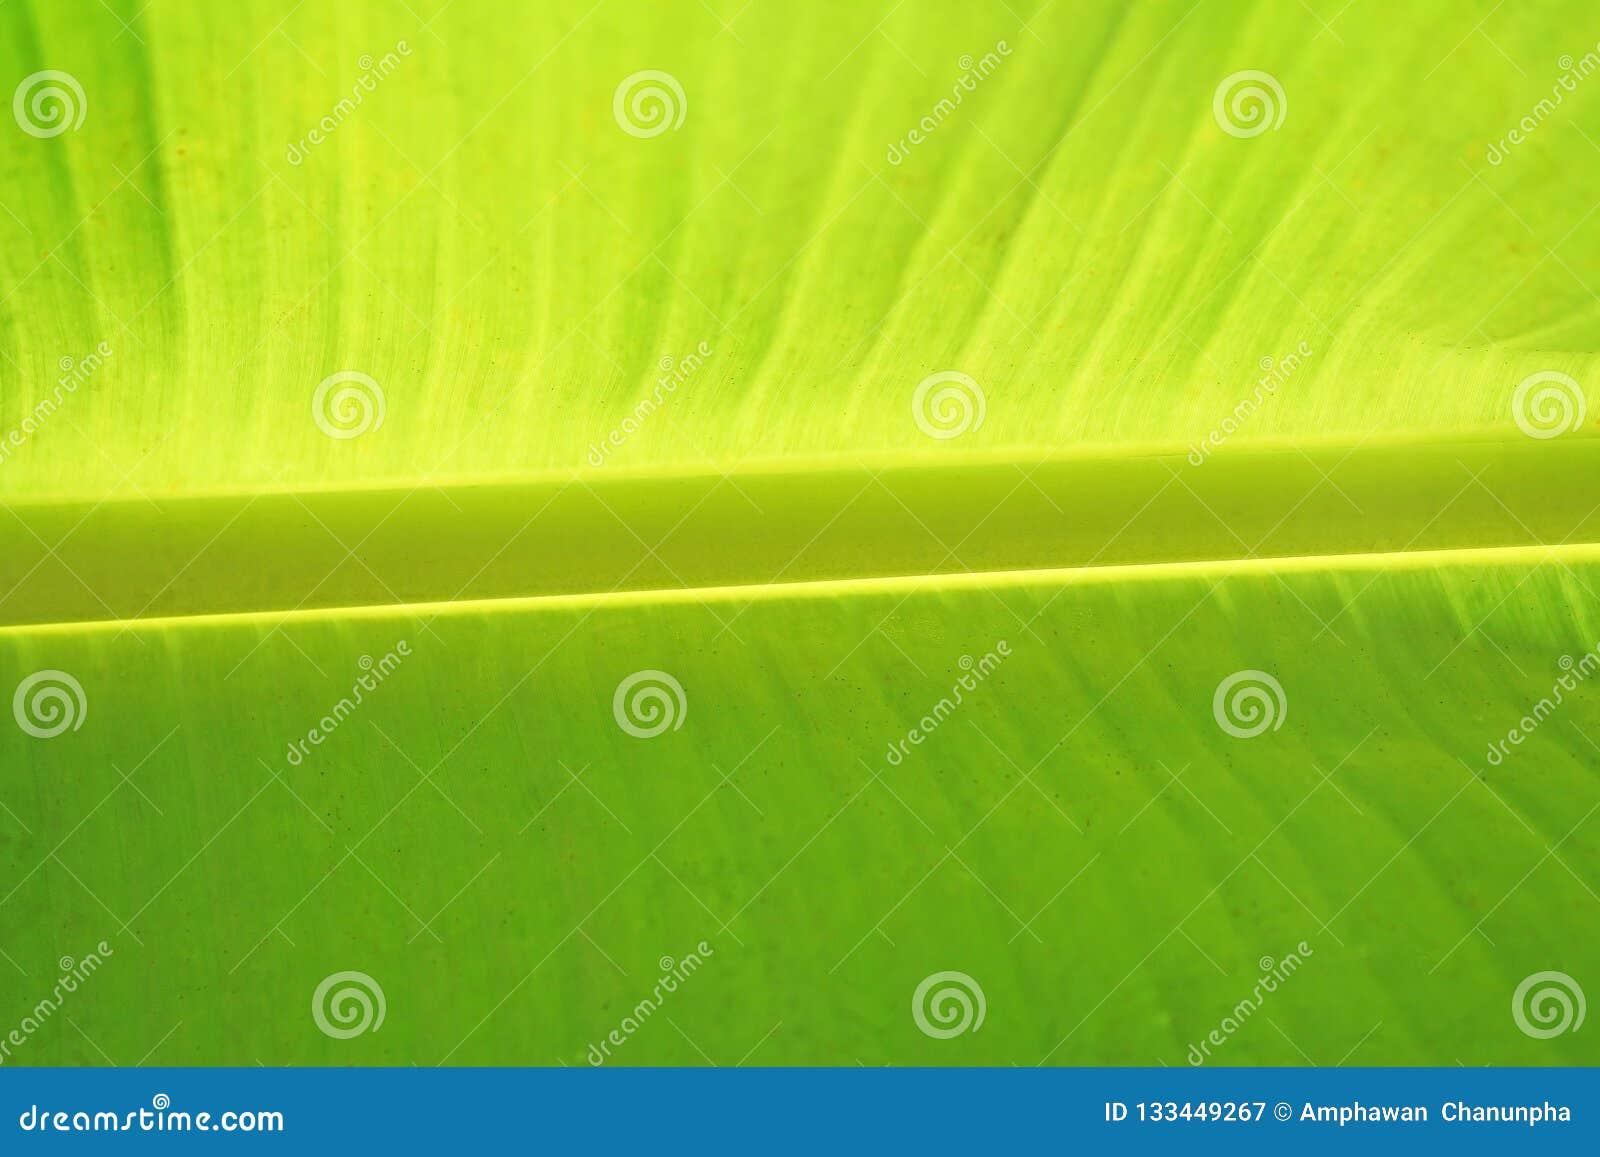 Предпосылка разрешения банана